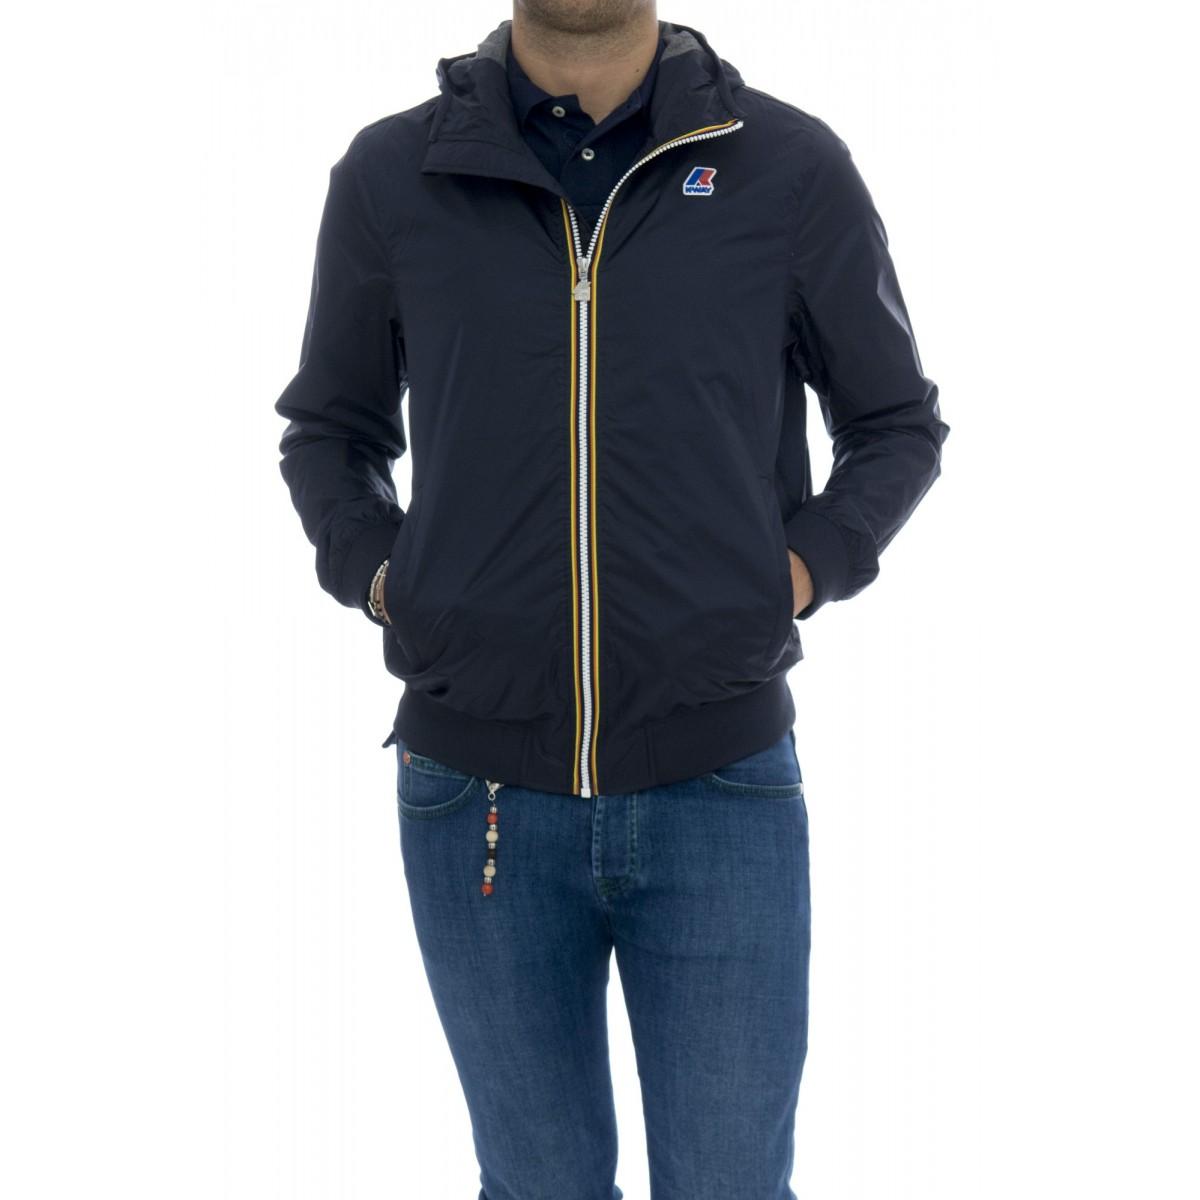 Giubbino - Justin jersey k007pc0 interno jersey